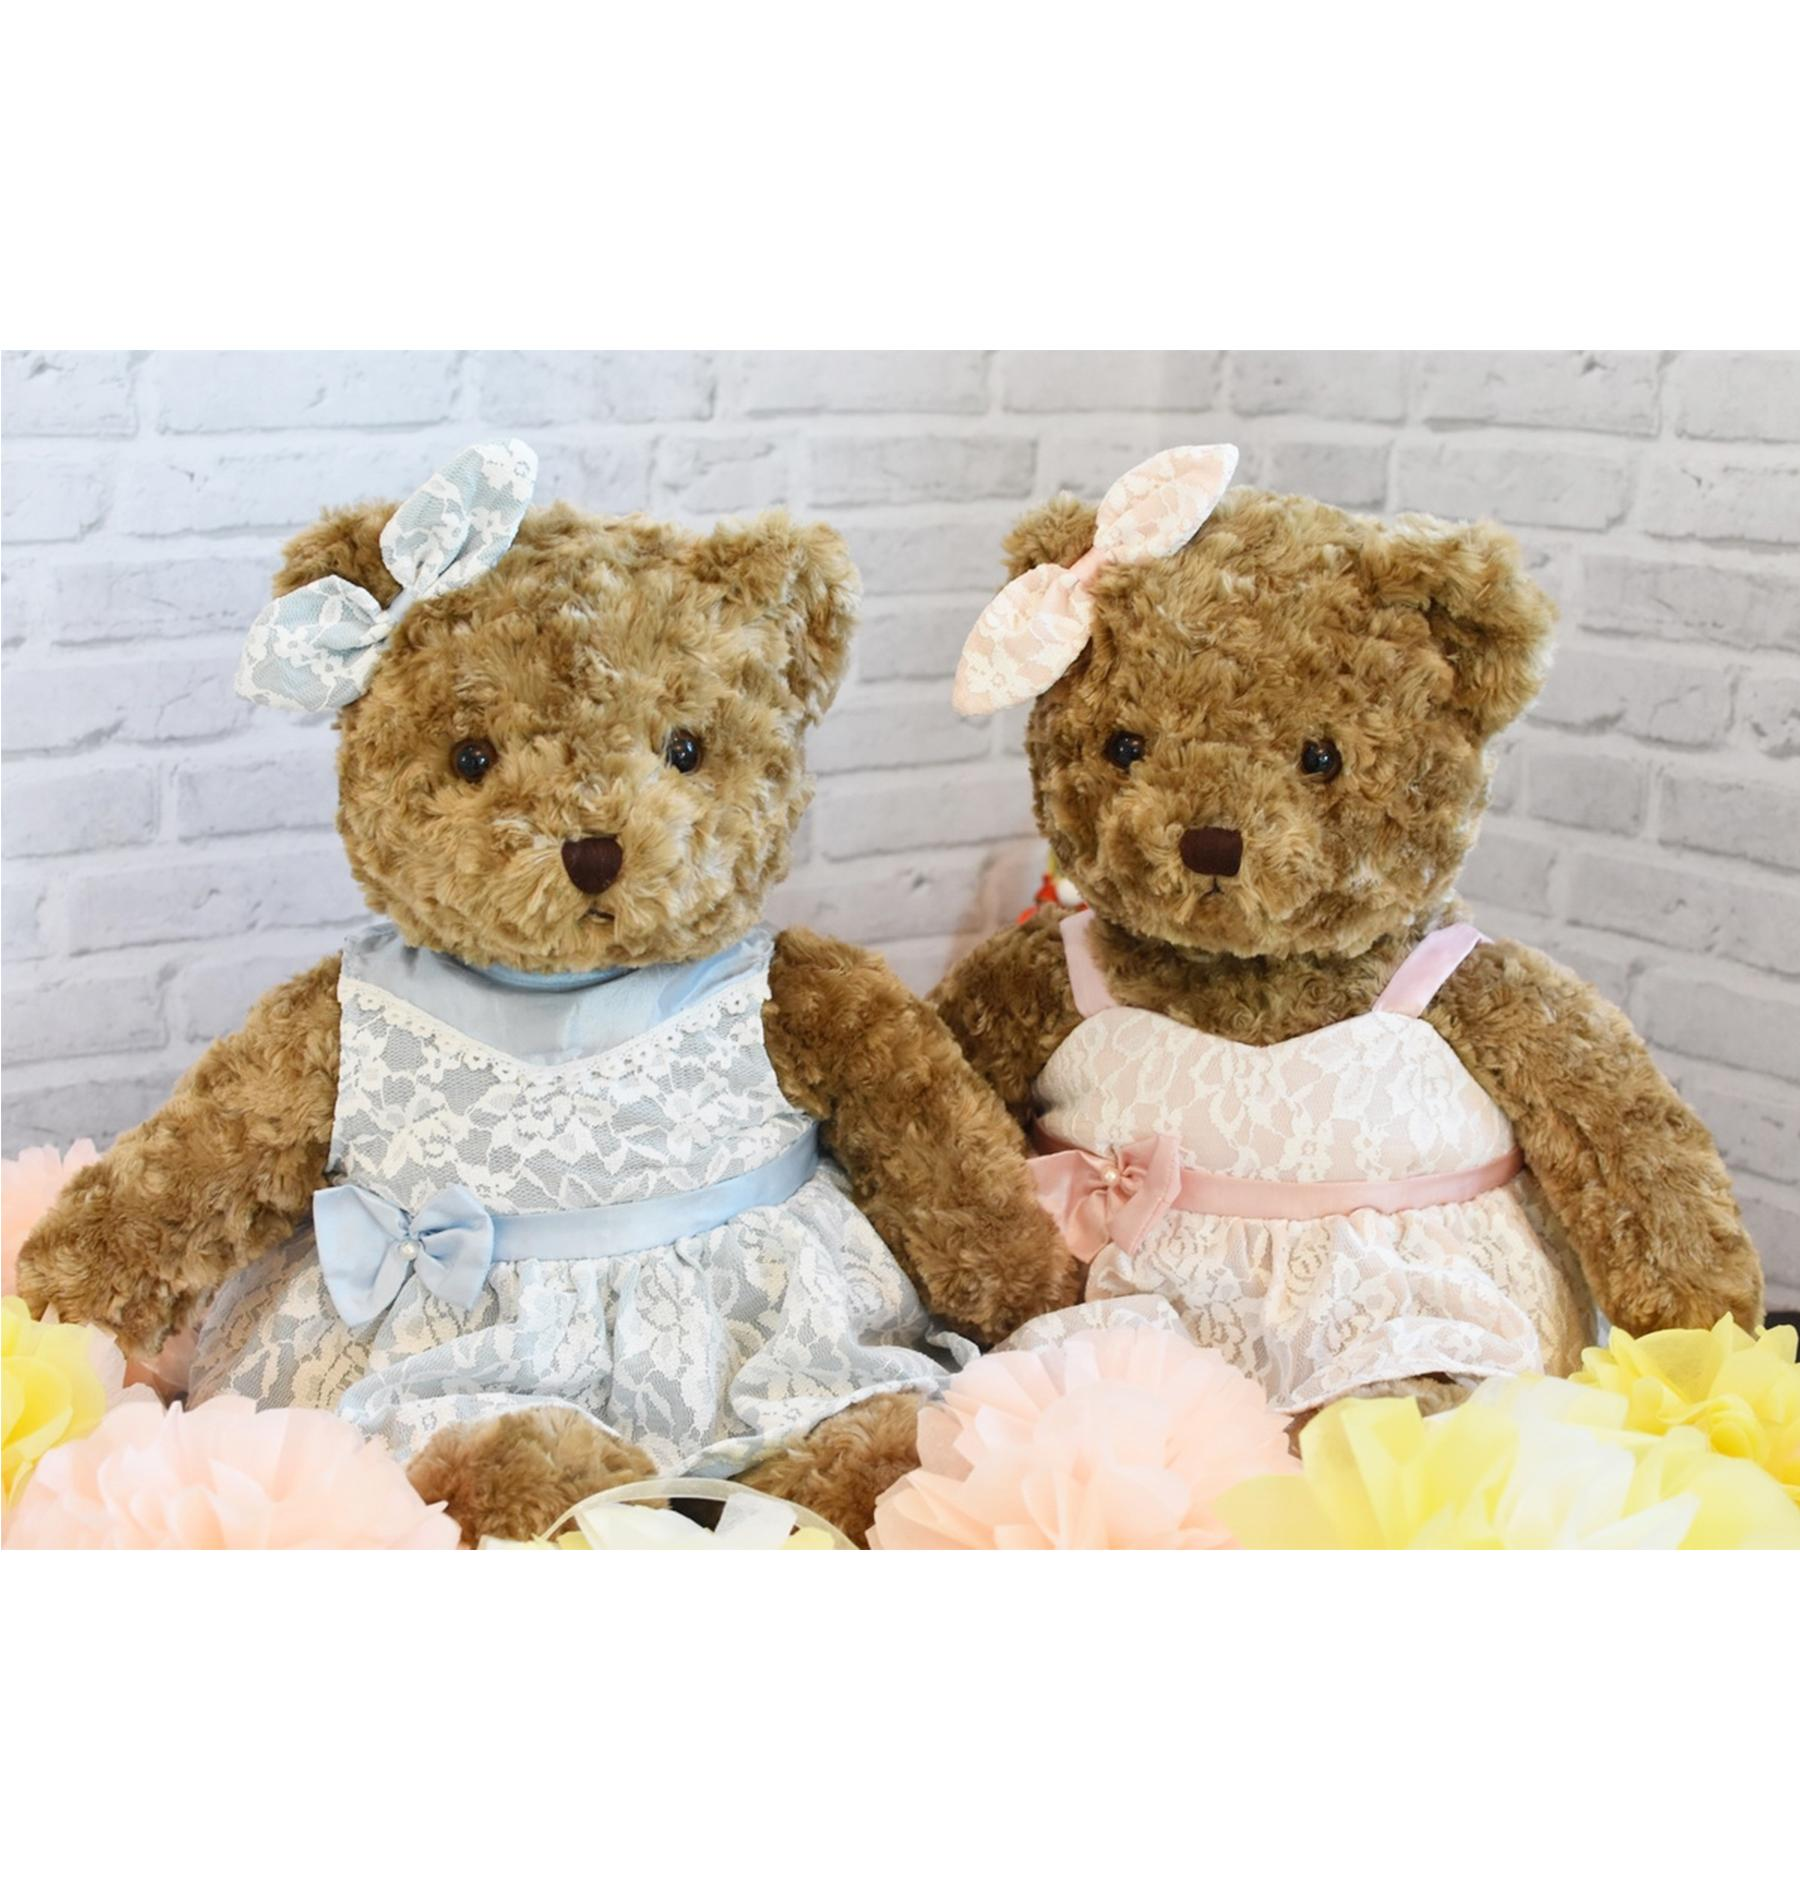 KADO TEDDY BEAR TOBY LOVELY 22 INCHI